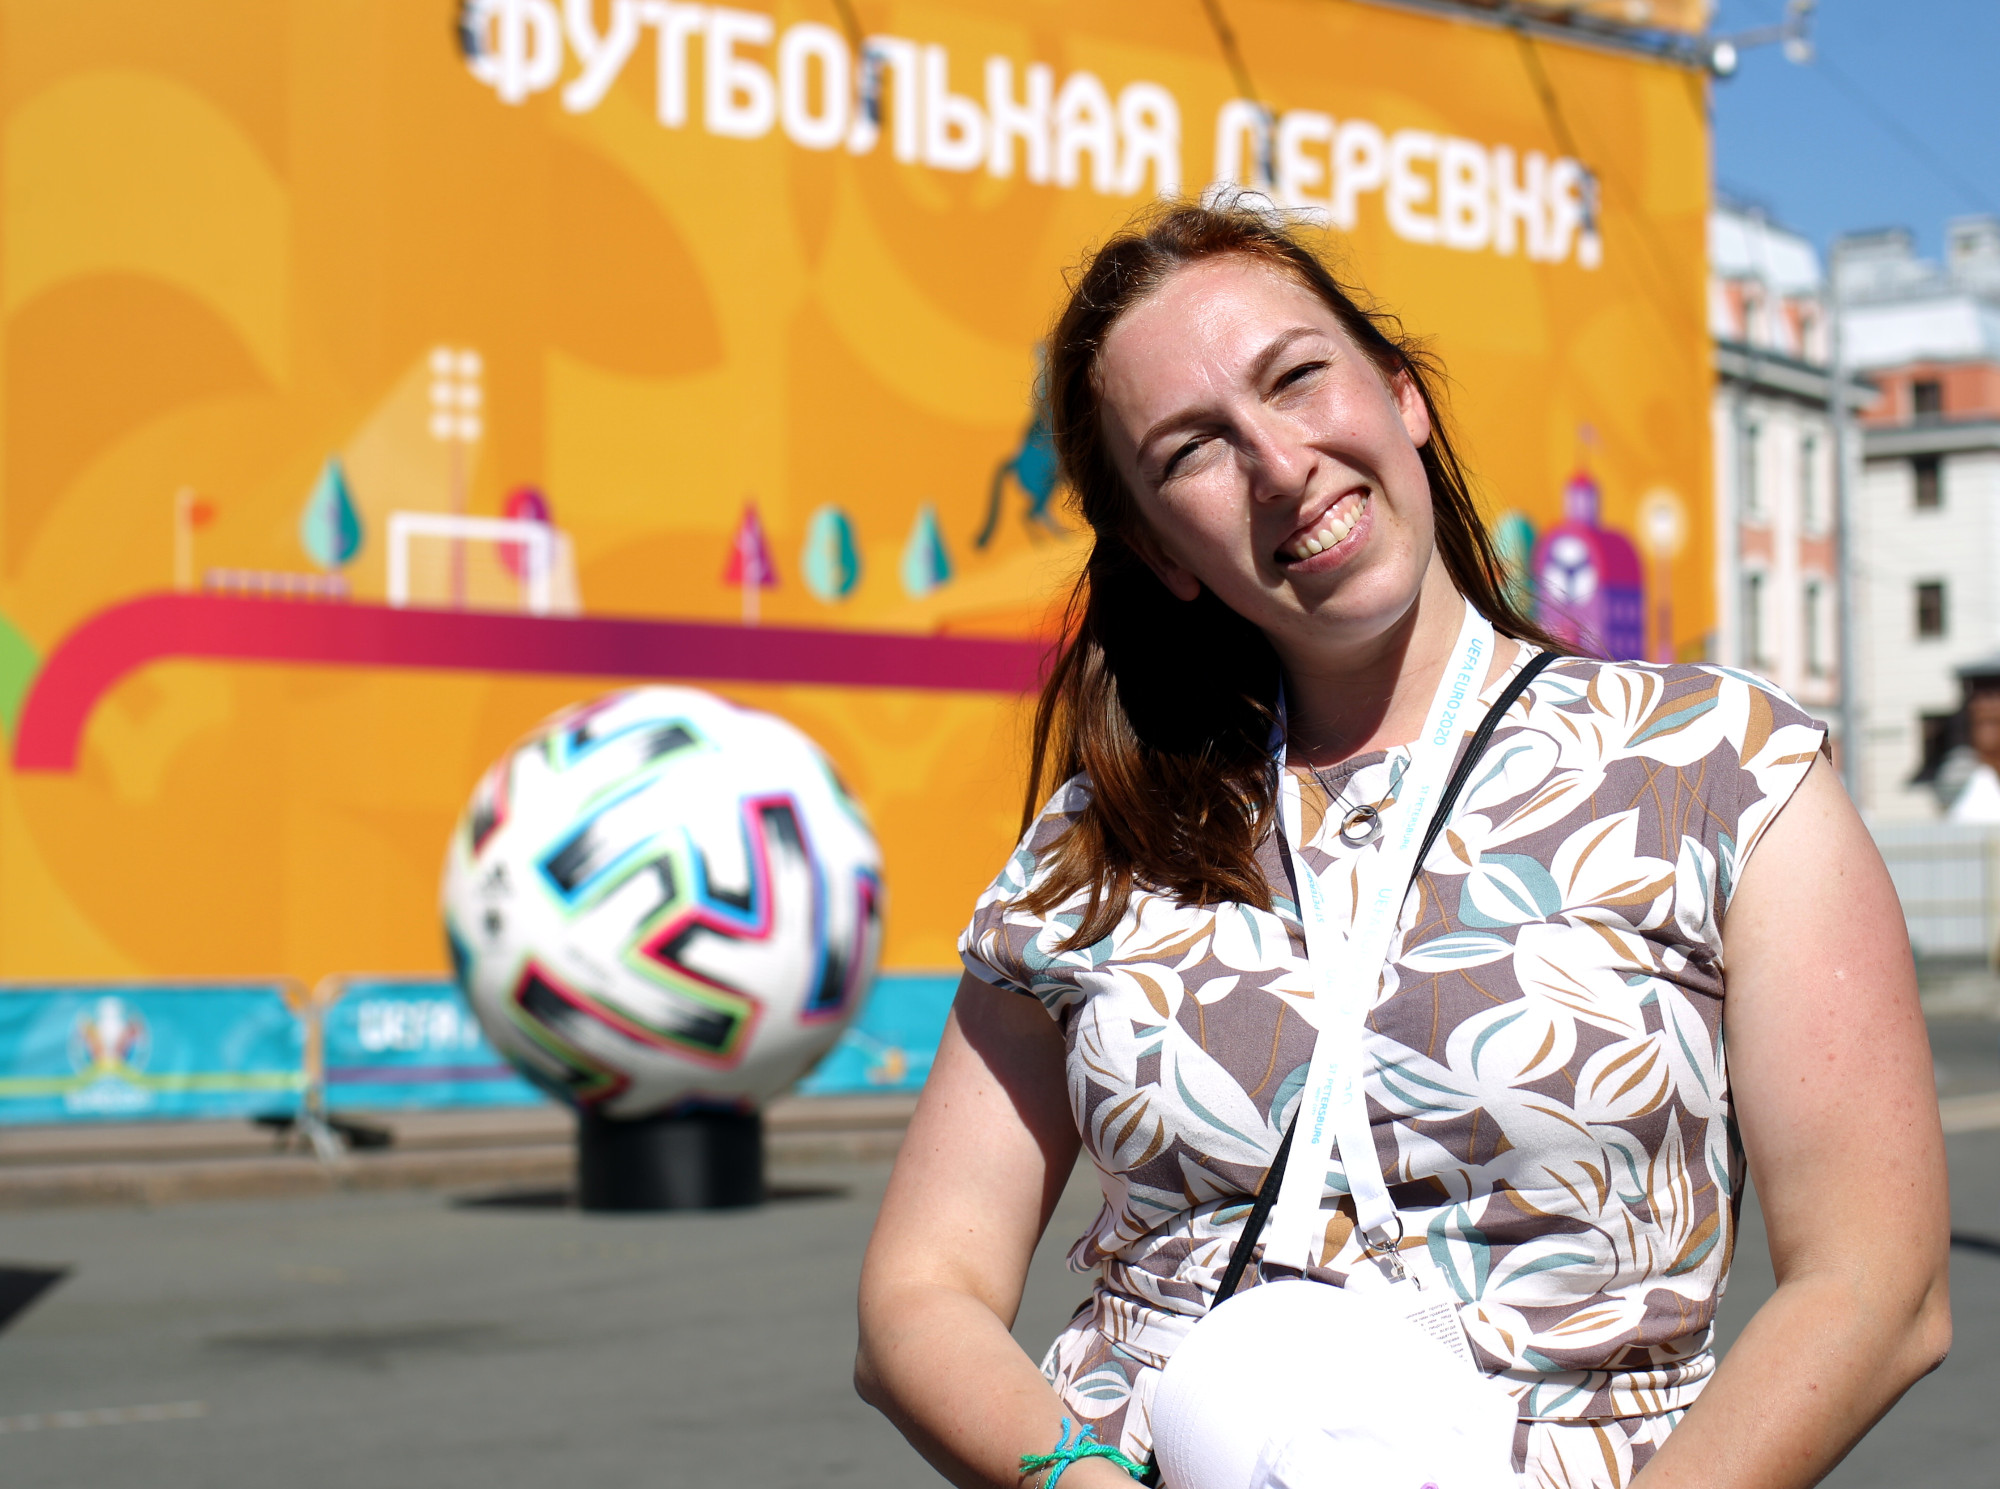 Елена Бугрова, болельщики, фанаты, фанзона, Евро 2020, чемпионат Европы по футболу